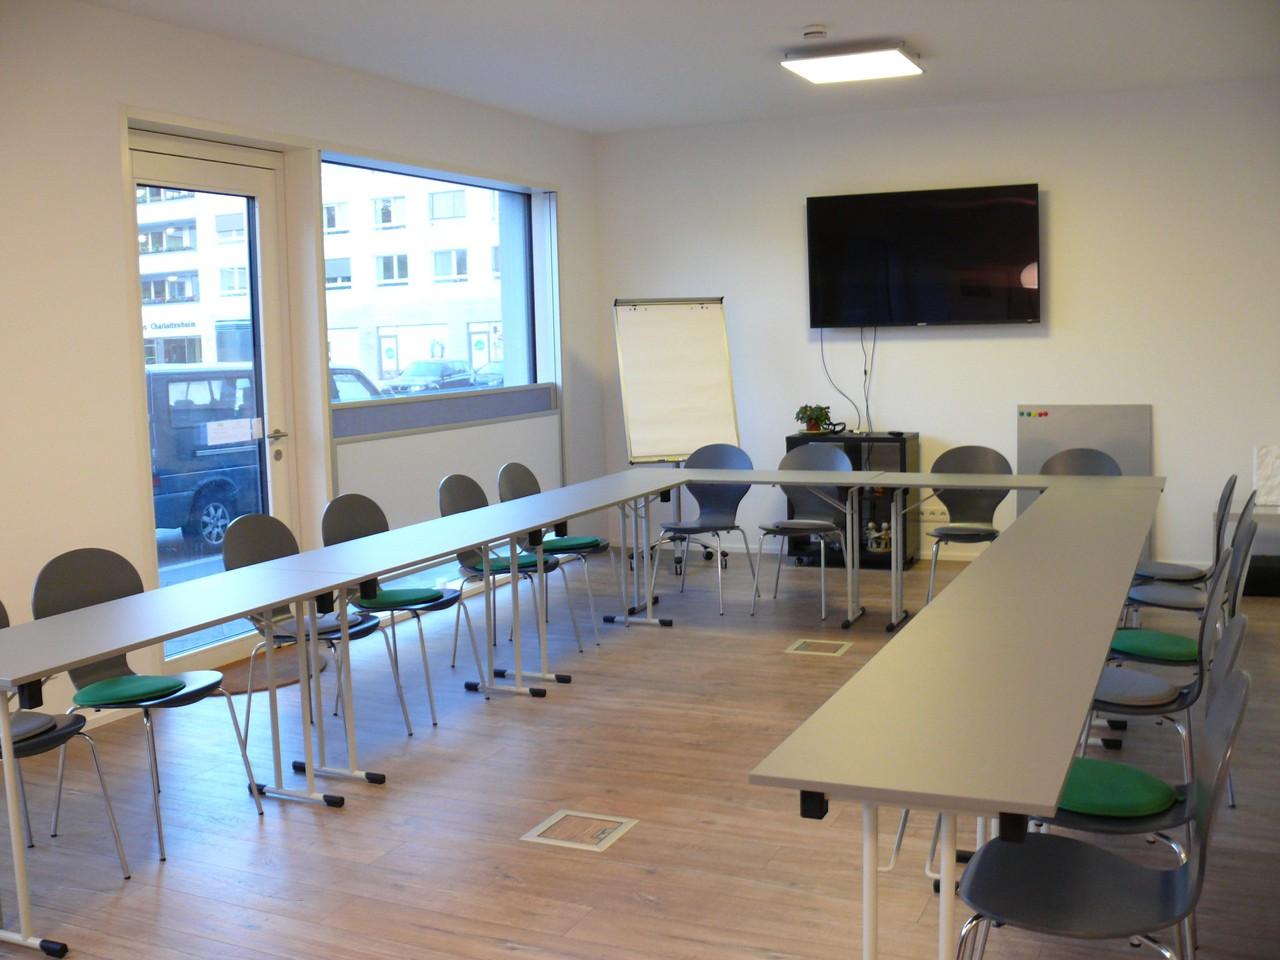 Berlin  Salle de réunion L88 image 0